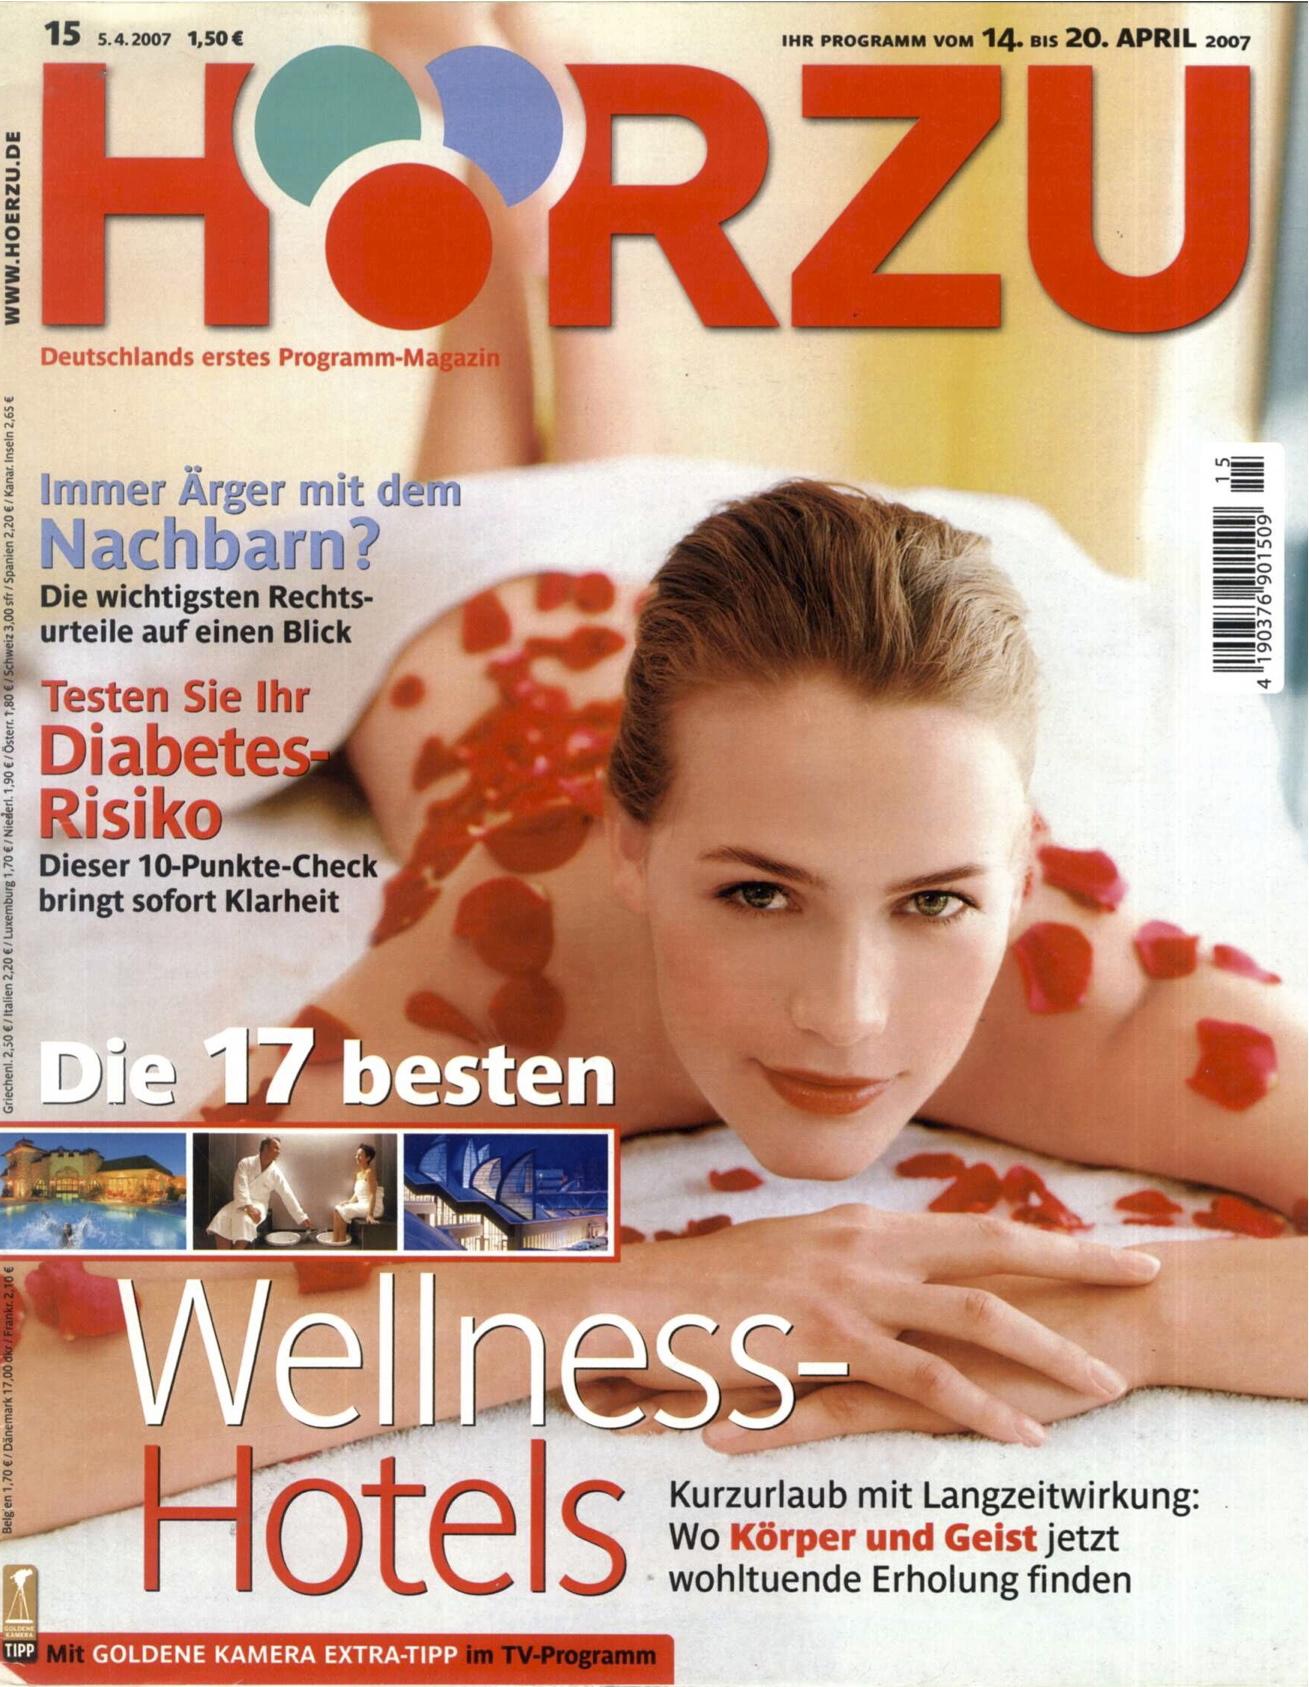 HZ_5.4.2007_Covers.jpg